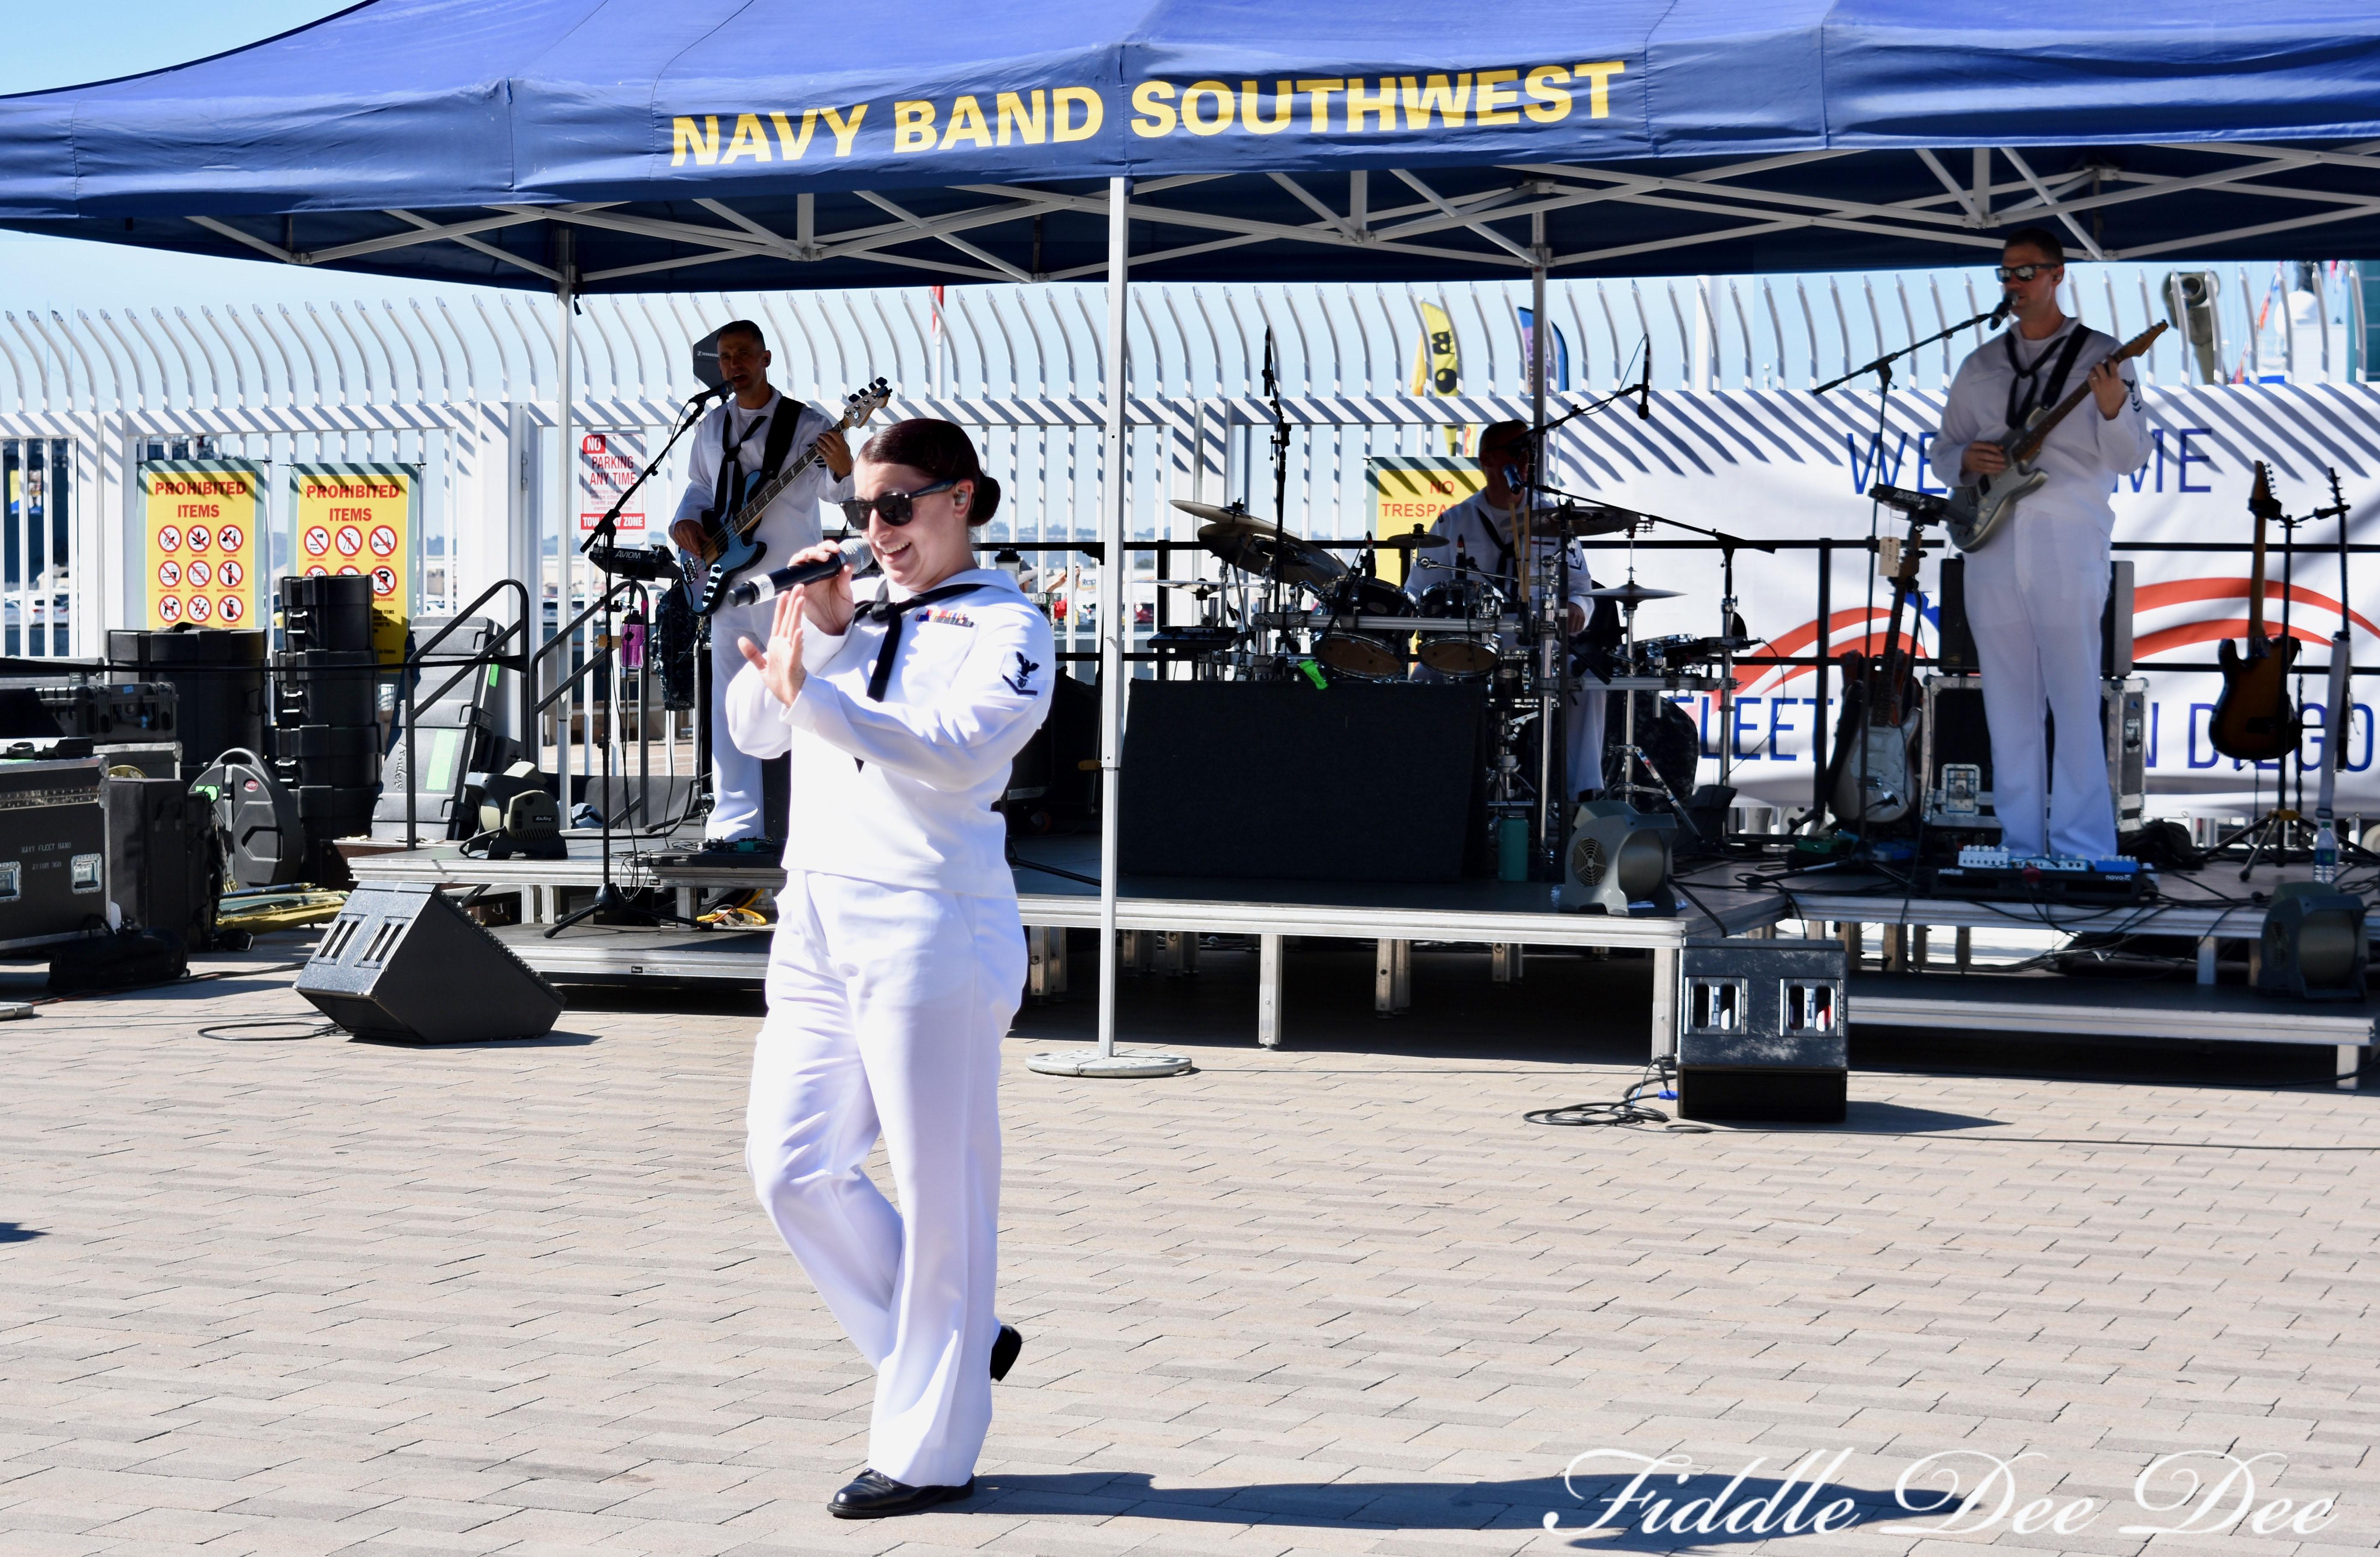 Navy-Band-Southwest-Fleet-Week-SanDiego